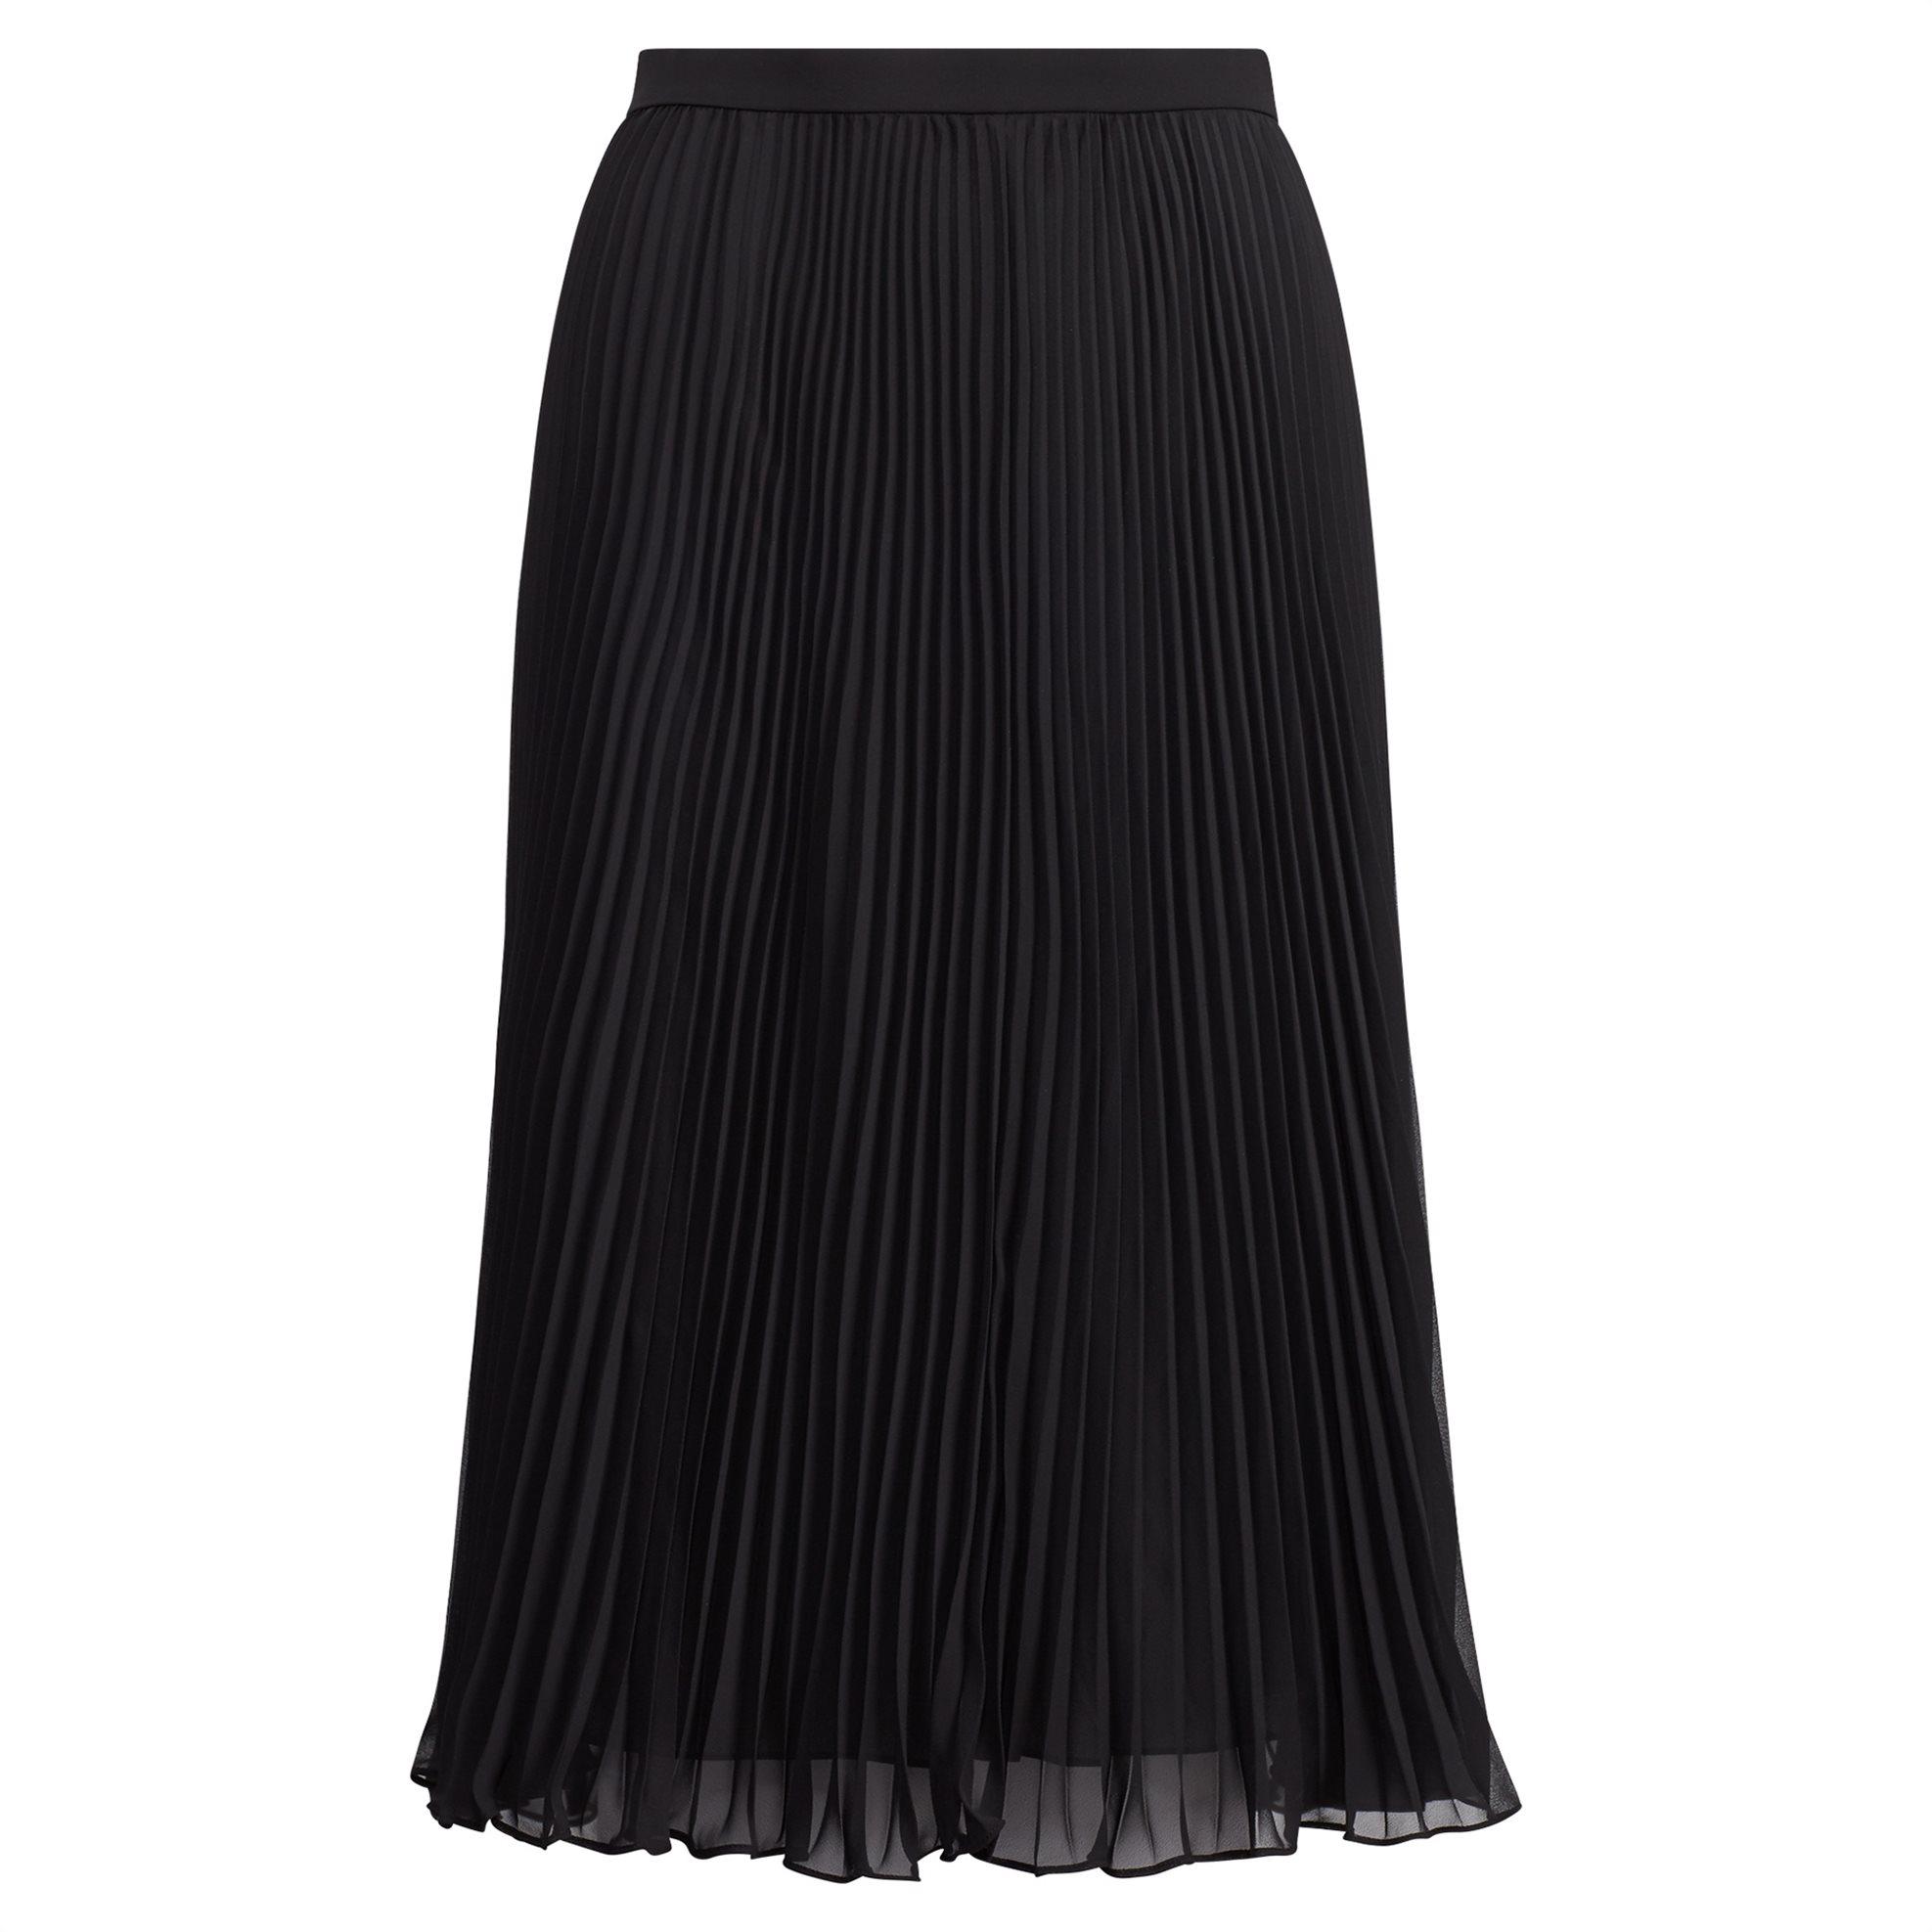 Polo Ralph Lauren γυναικεία φούστα πλισέ Pleated Georgette Skirt - 211705210001  γυναικα   ρουχα   φούστες   midi